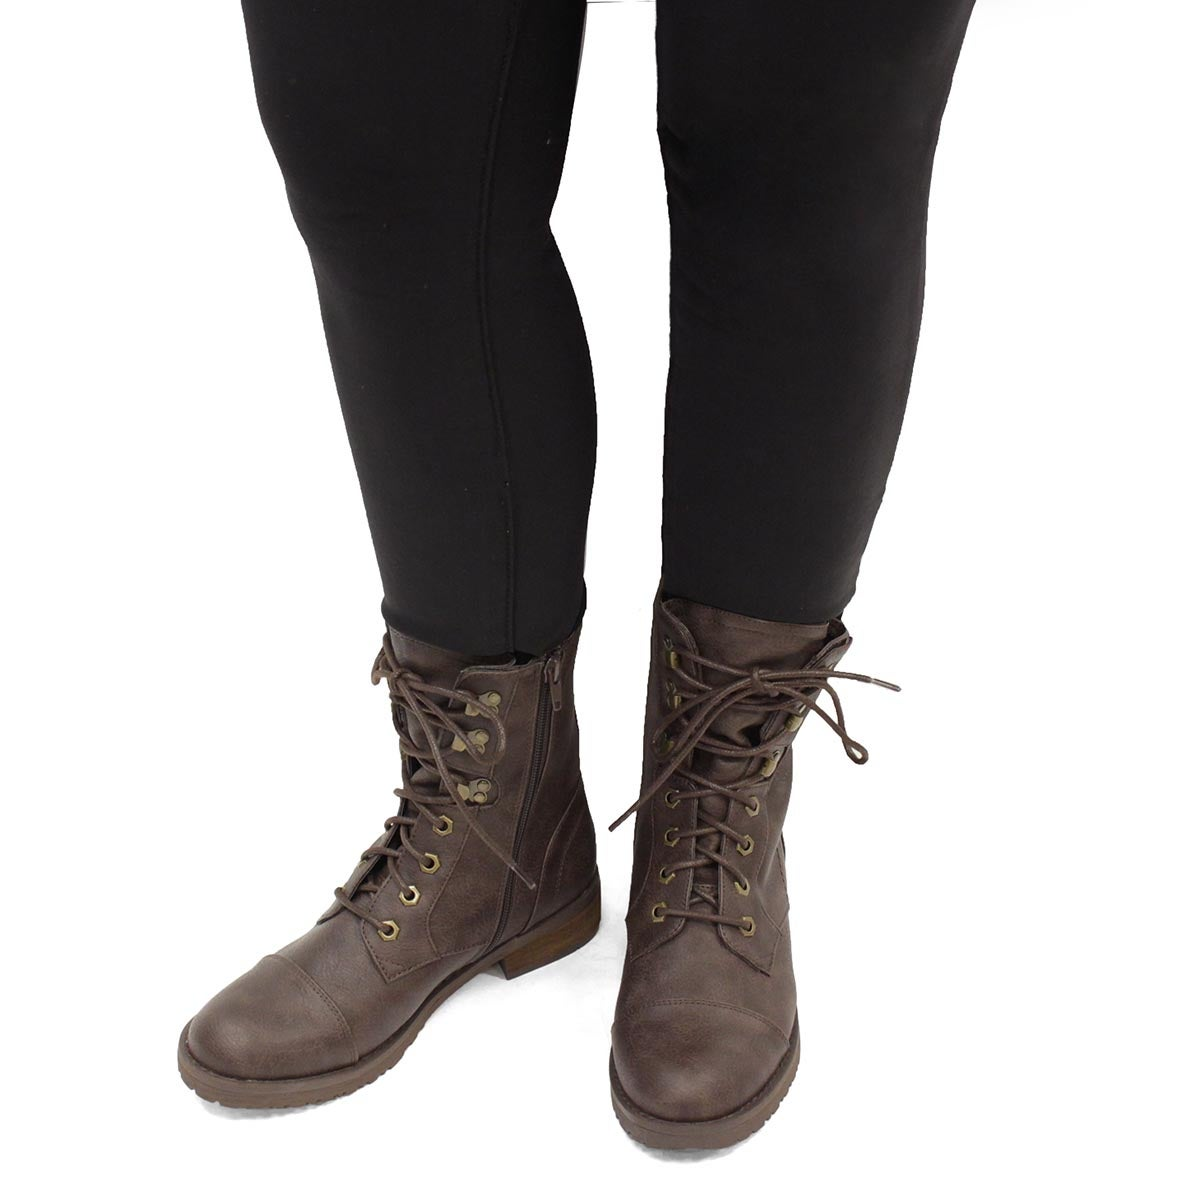 Lds Tegan 2 brown lace up combat boot